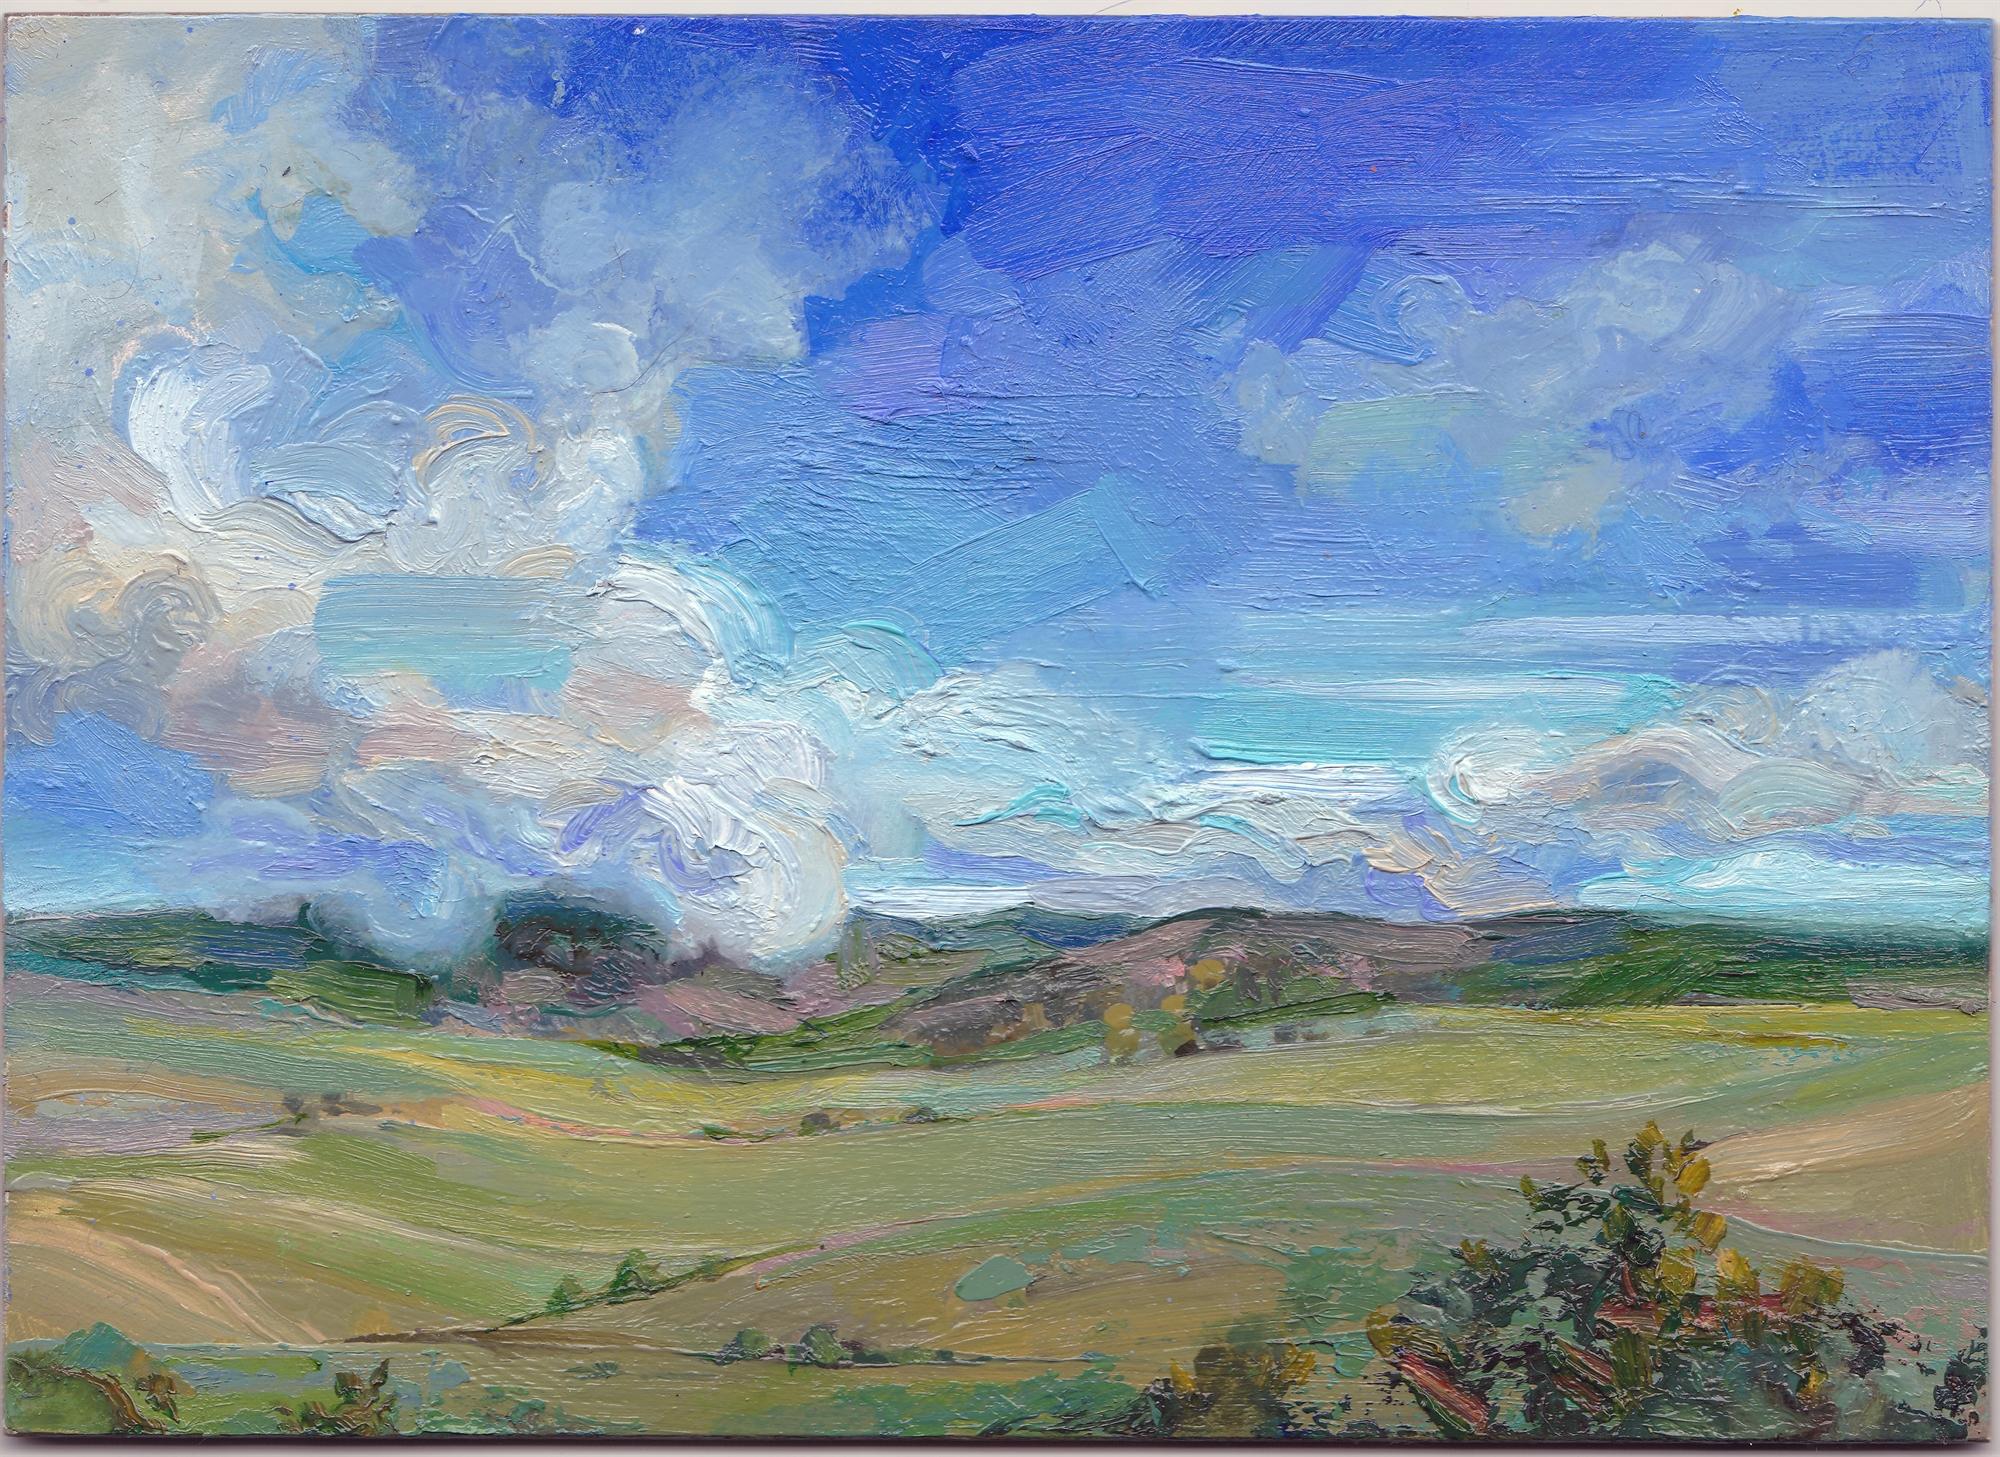 Skyline - Midday by Charis Carmichael Braun